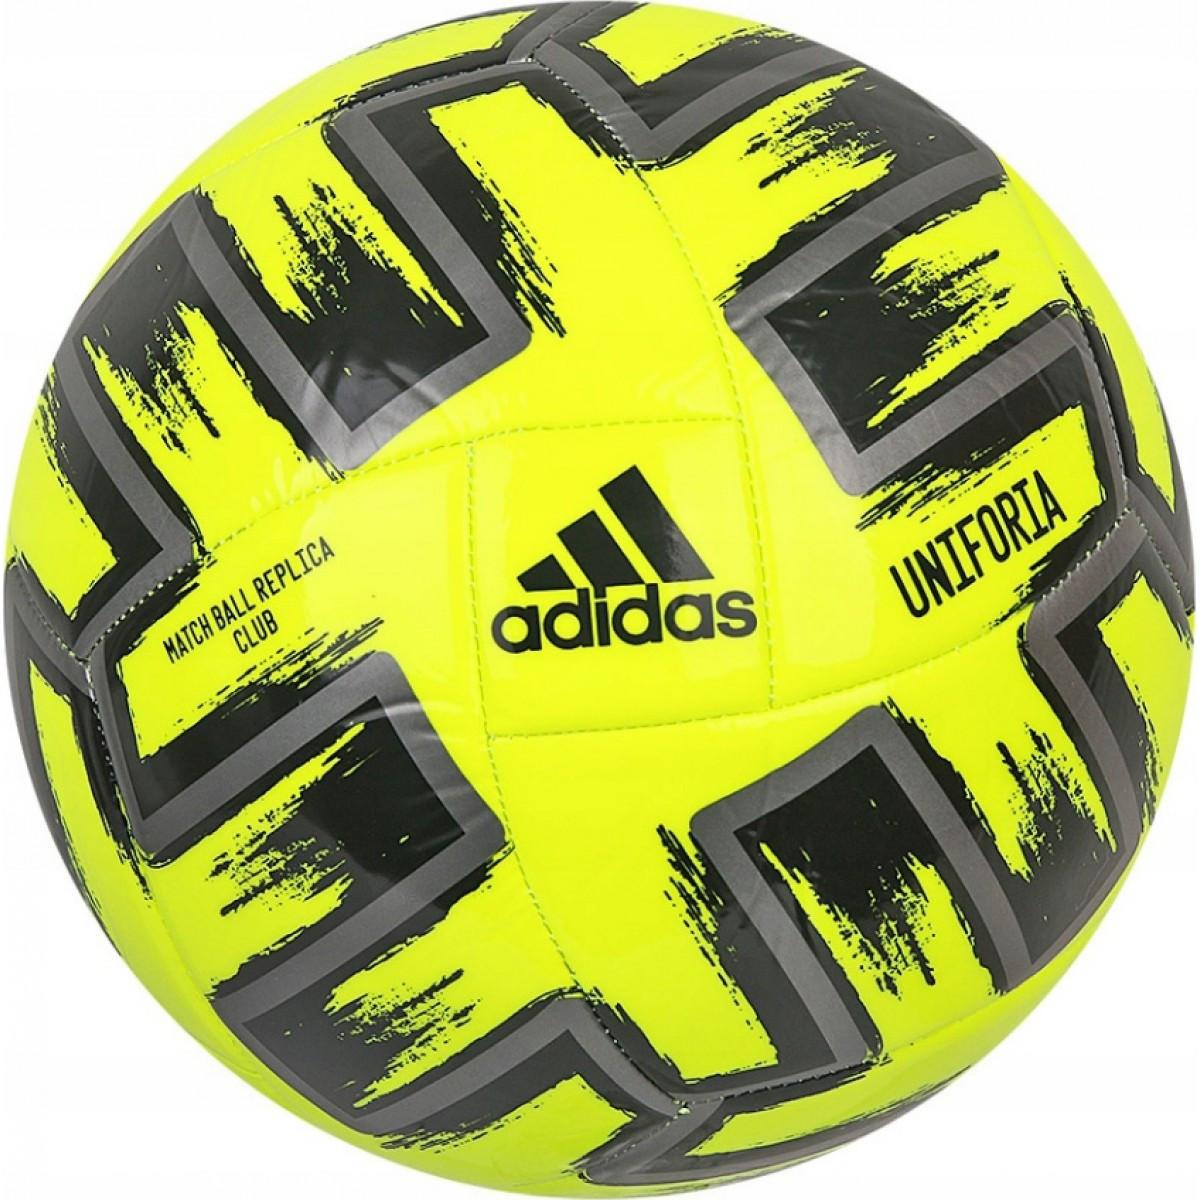 М'яч футбольний Adidas Uniforia Club FP9706 Size 5